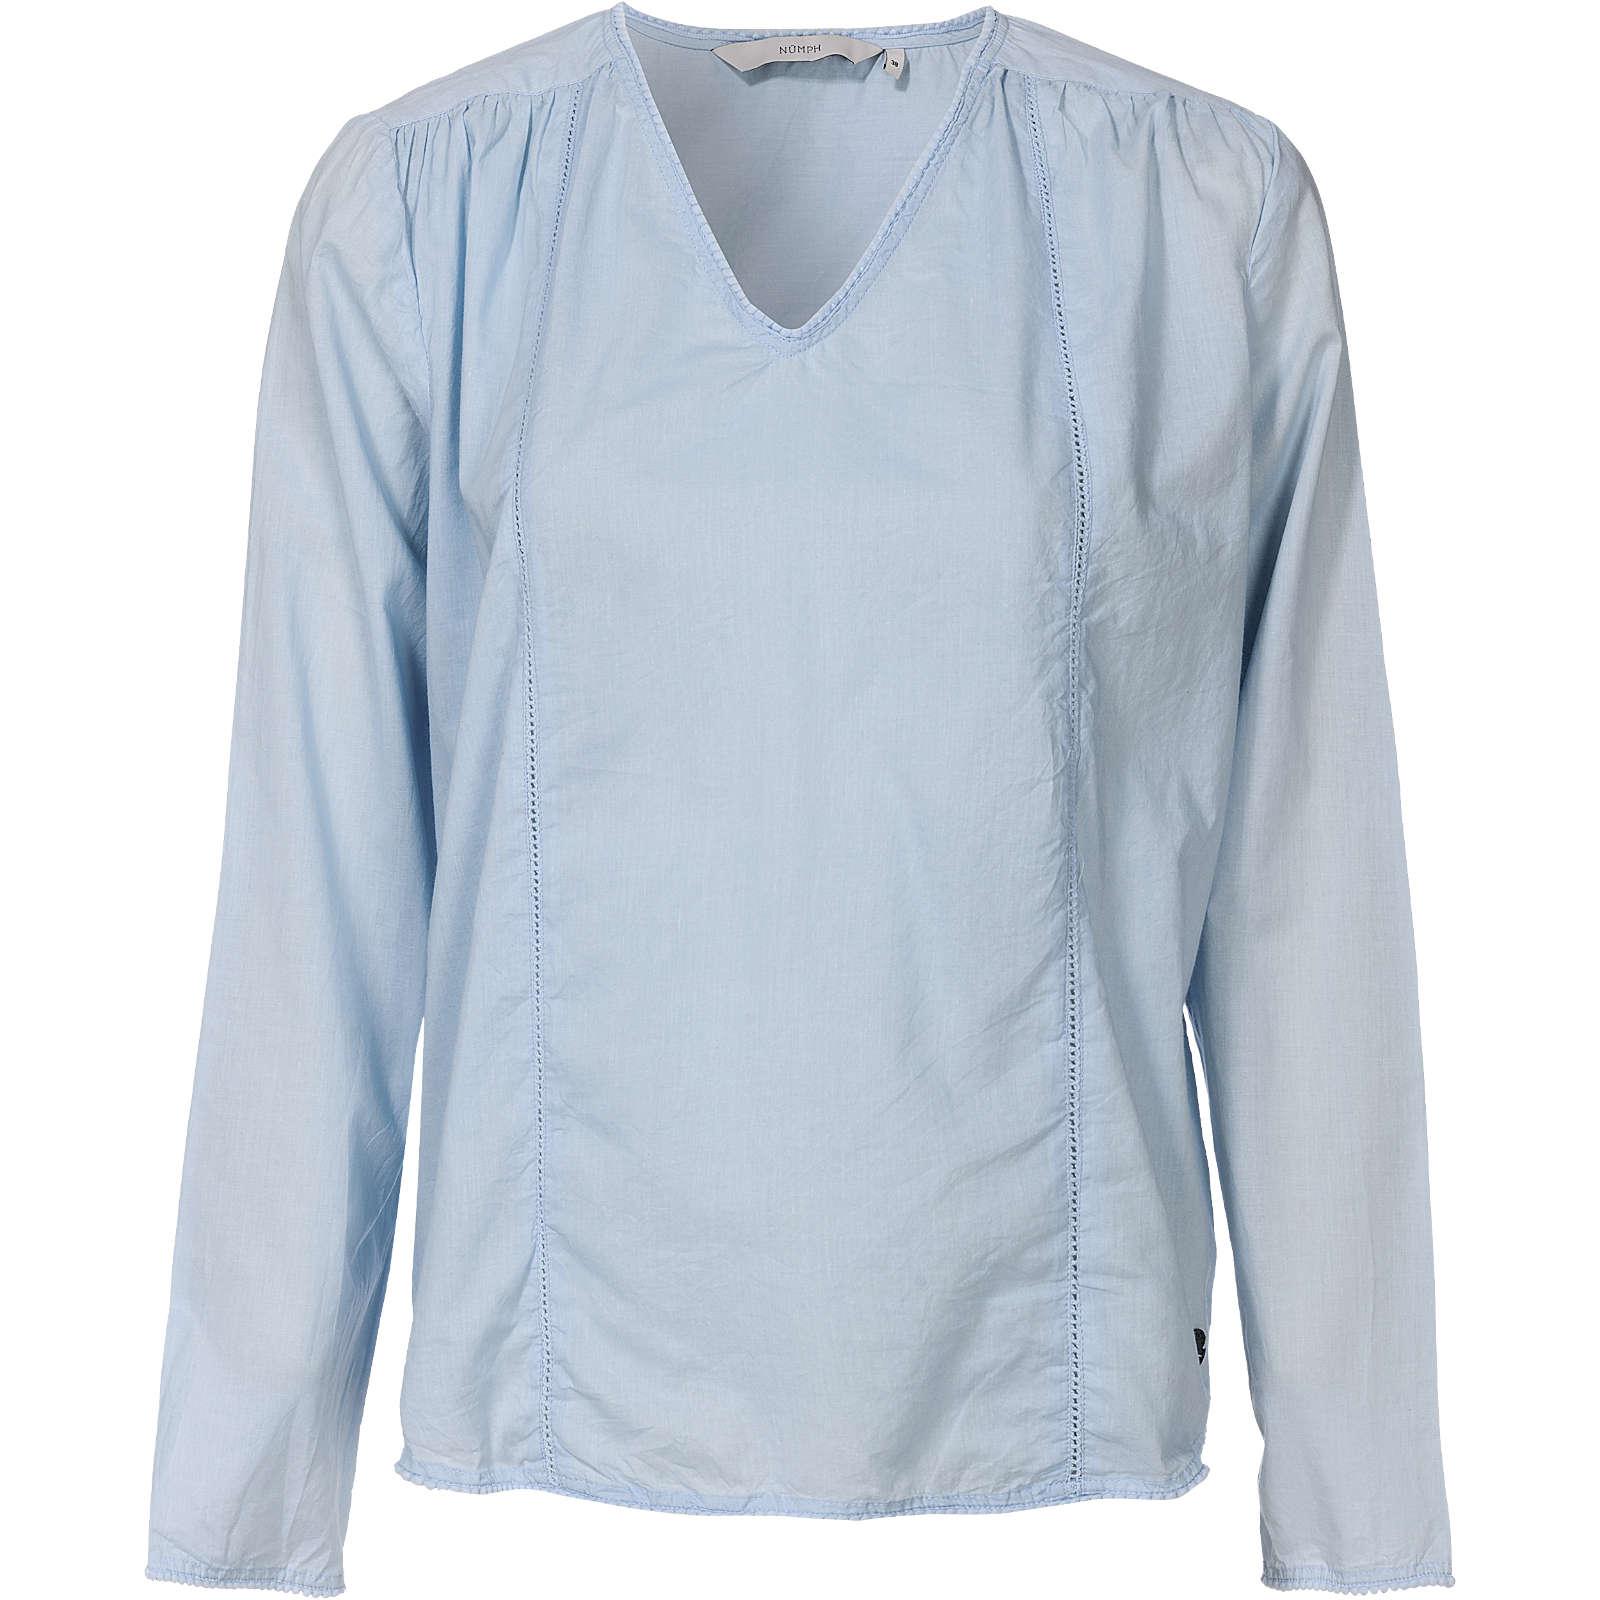 nümph Bluse blau Damen Gr. 40